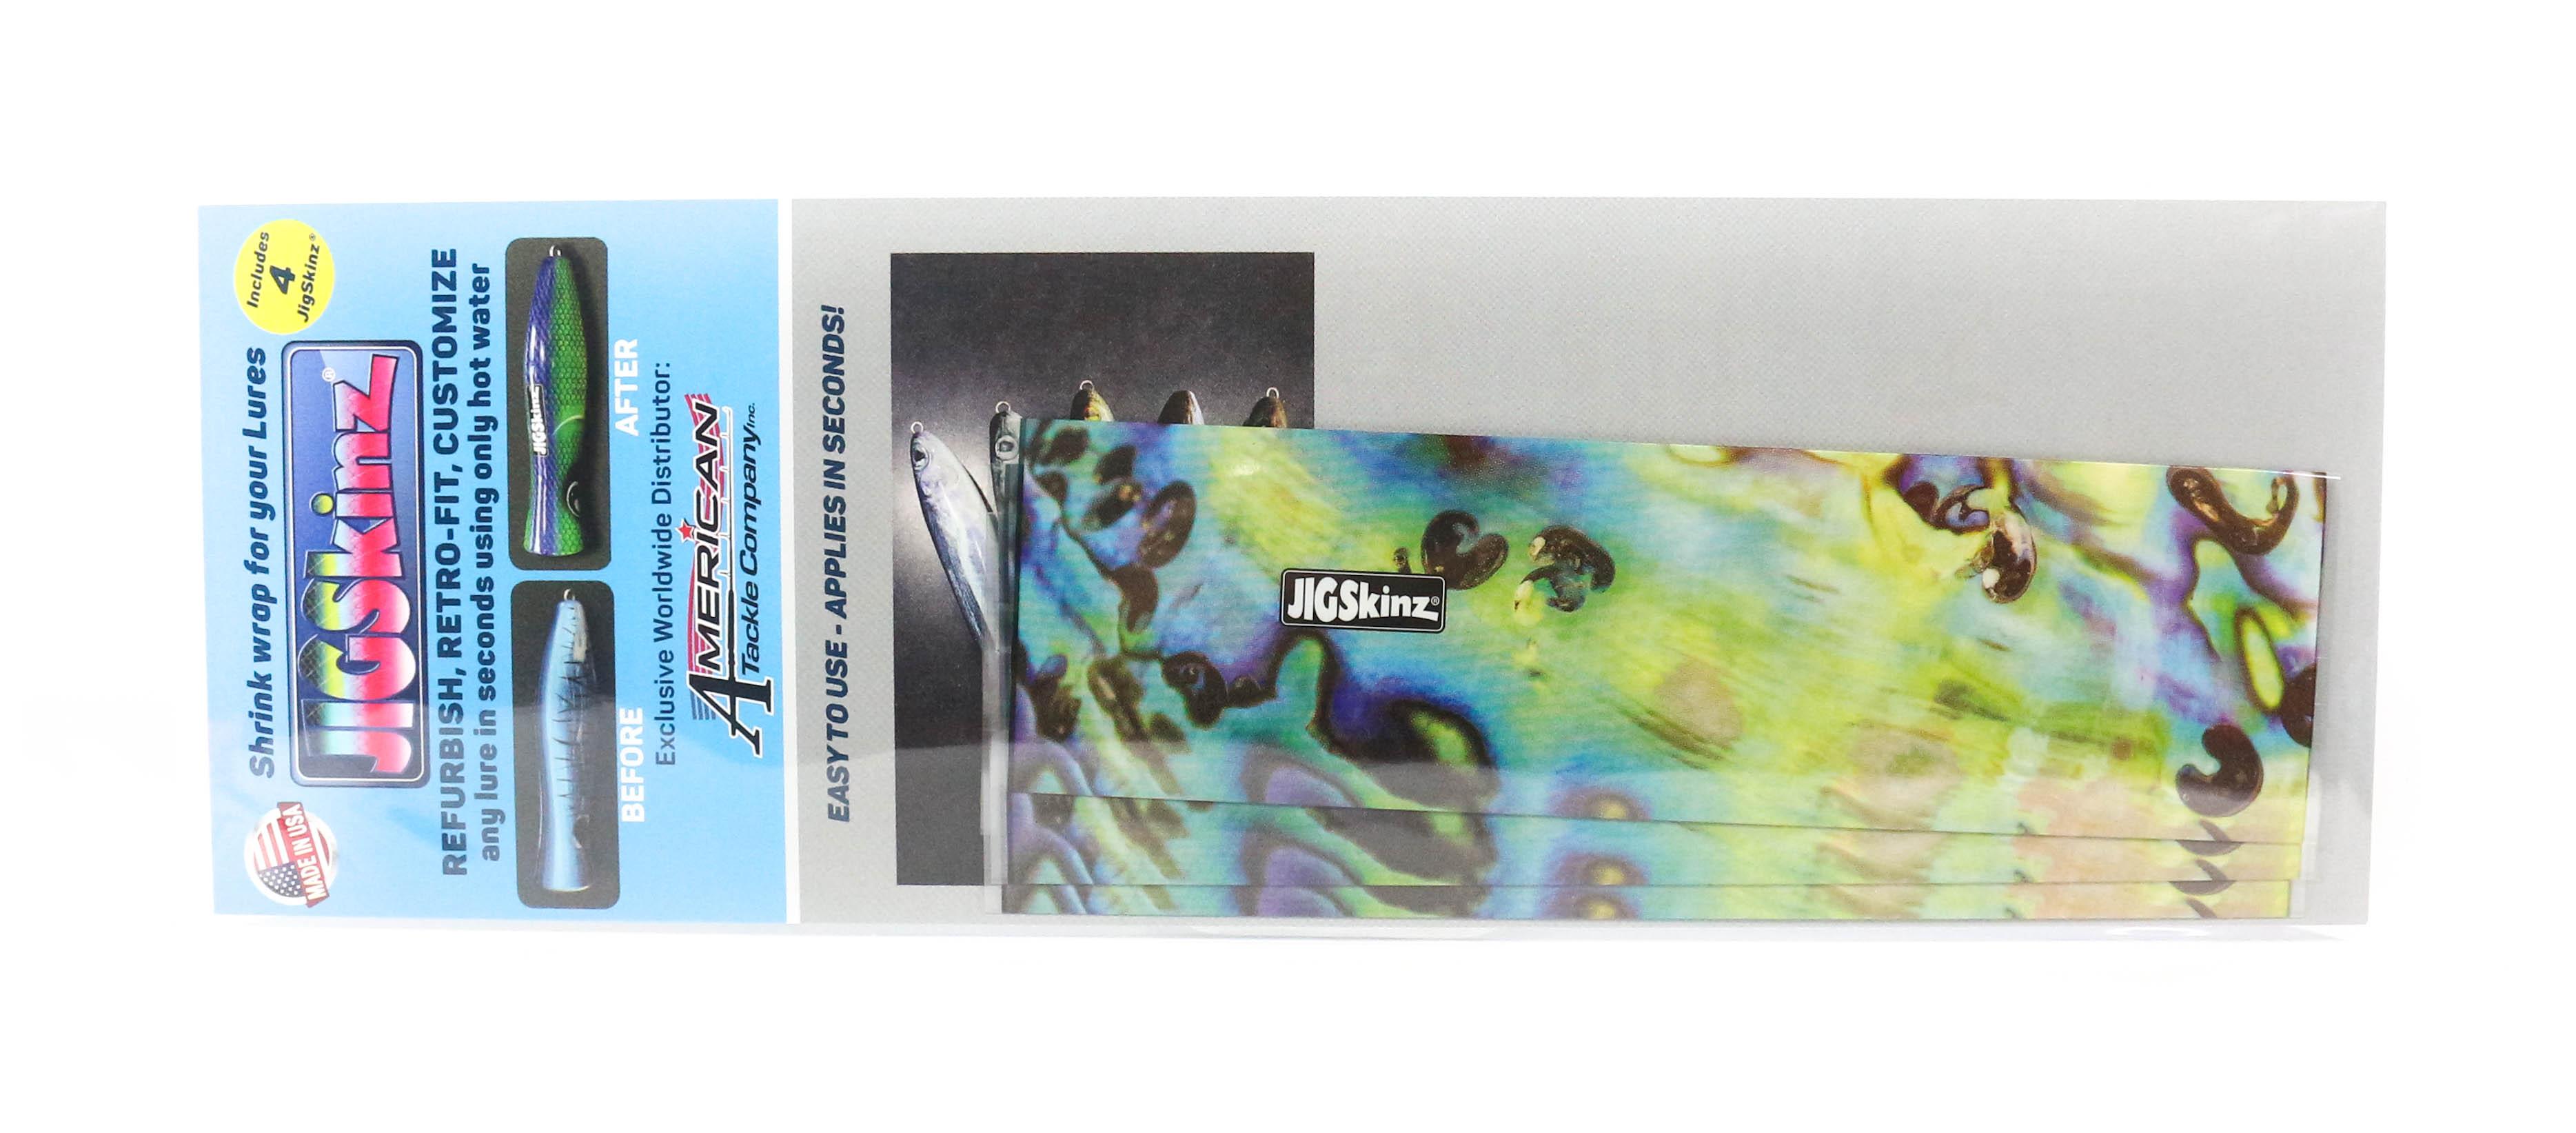 Jigskinz JZABY-M4 Abalone Yellow 170 x 95mm x 4 pieces Medium (3312)